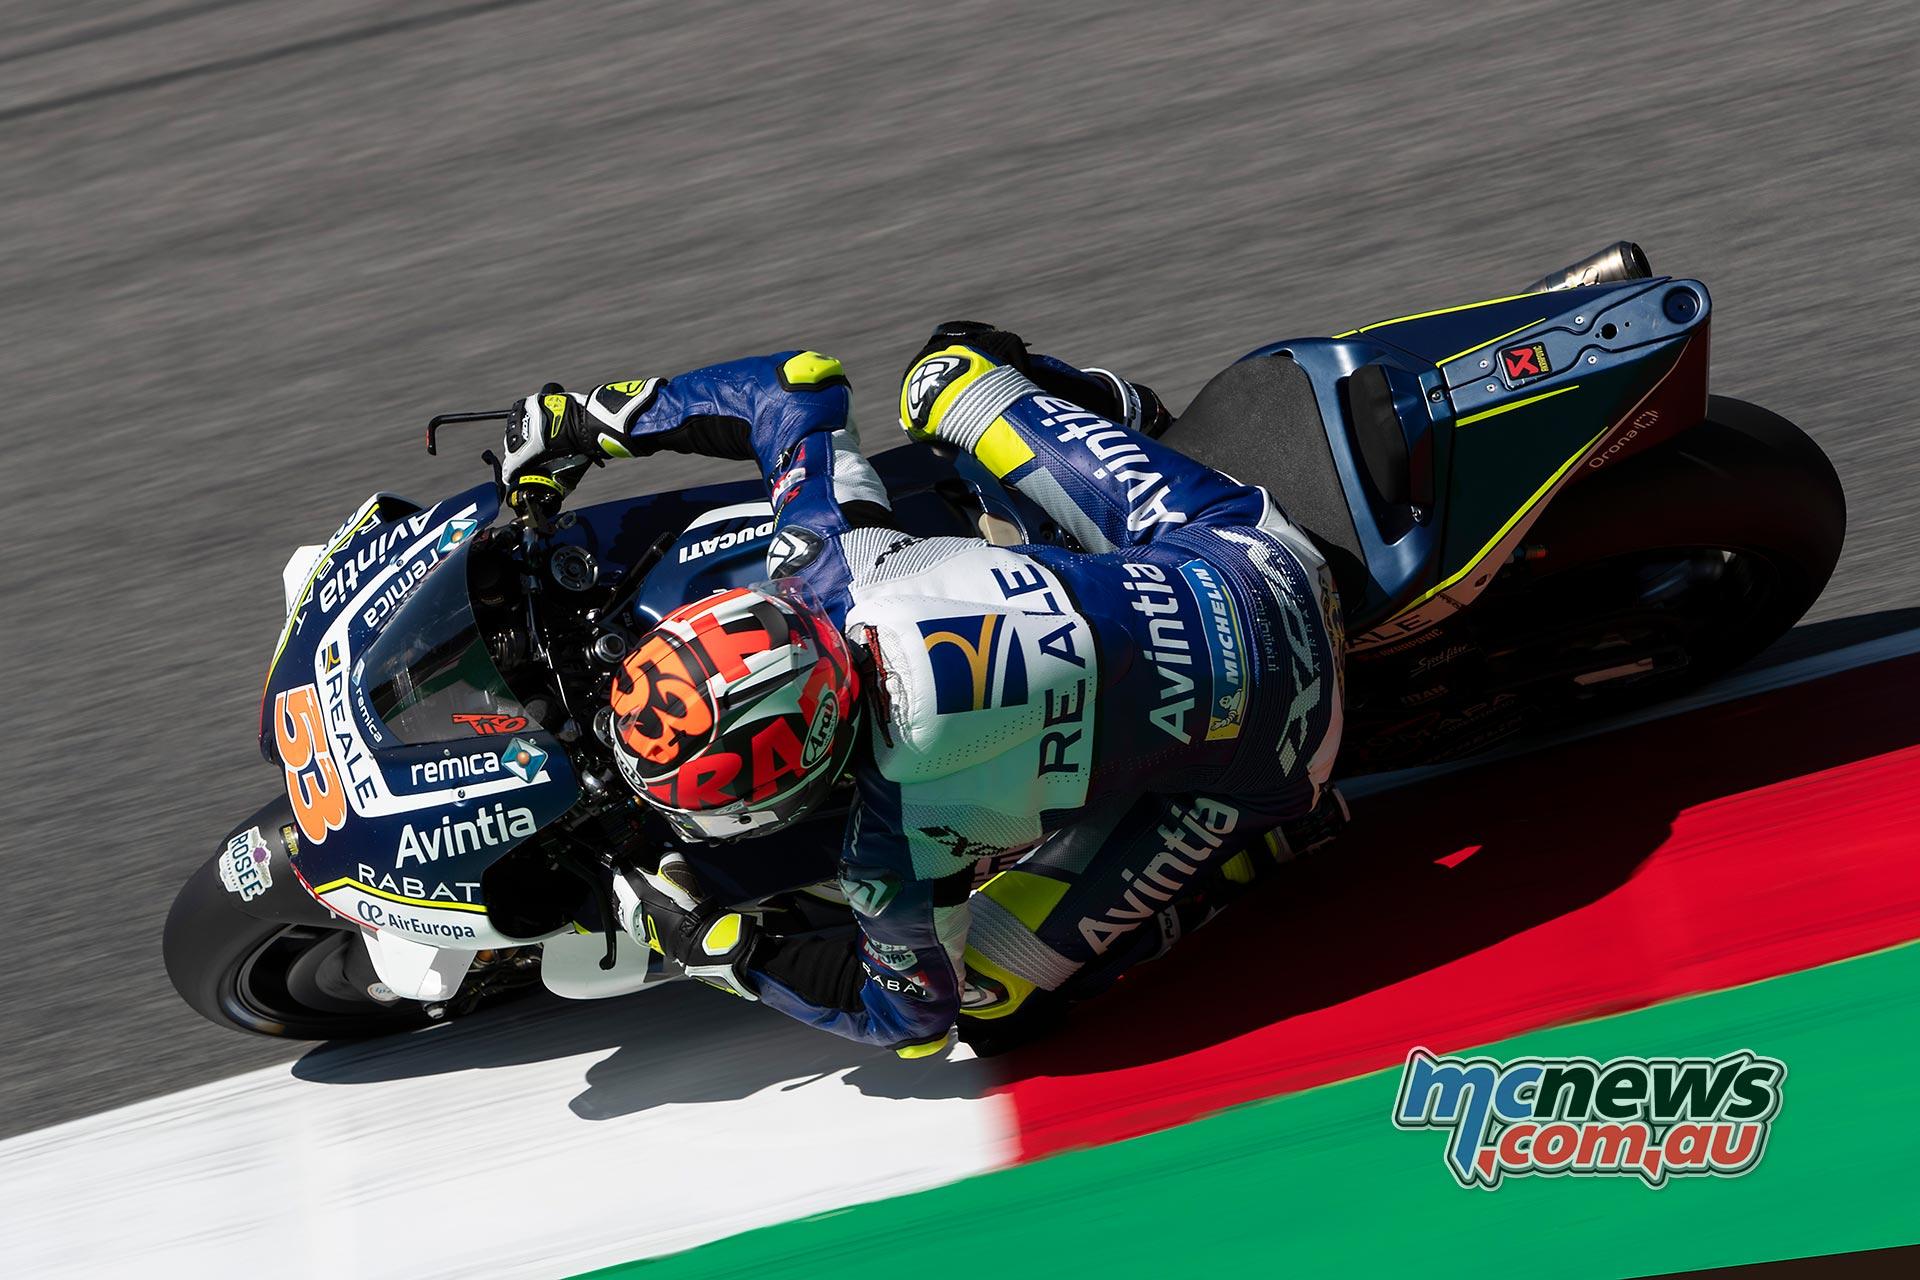 MotoGP Rnd Mugello Race Tito Rabat